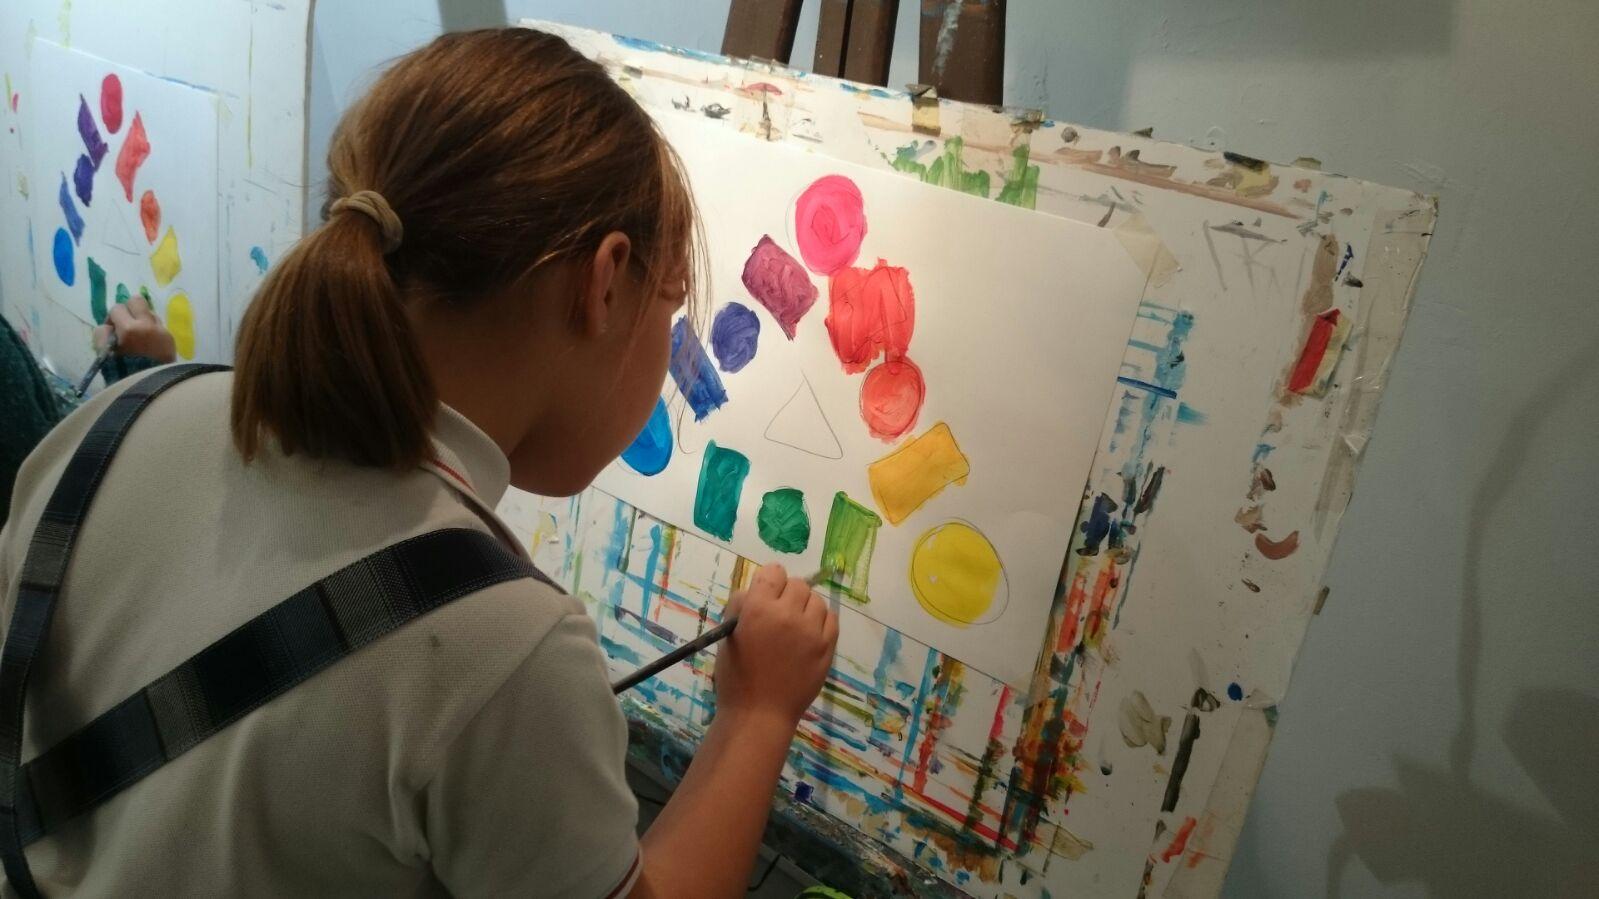 Minicurso de pintura para ni os aula galiart oviedo mukina - Pintura acrilica pared ...